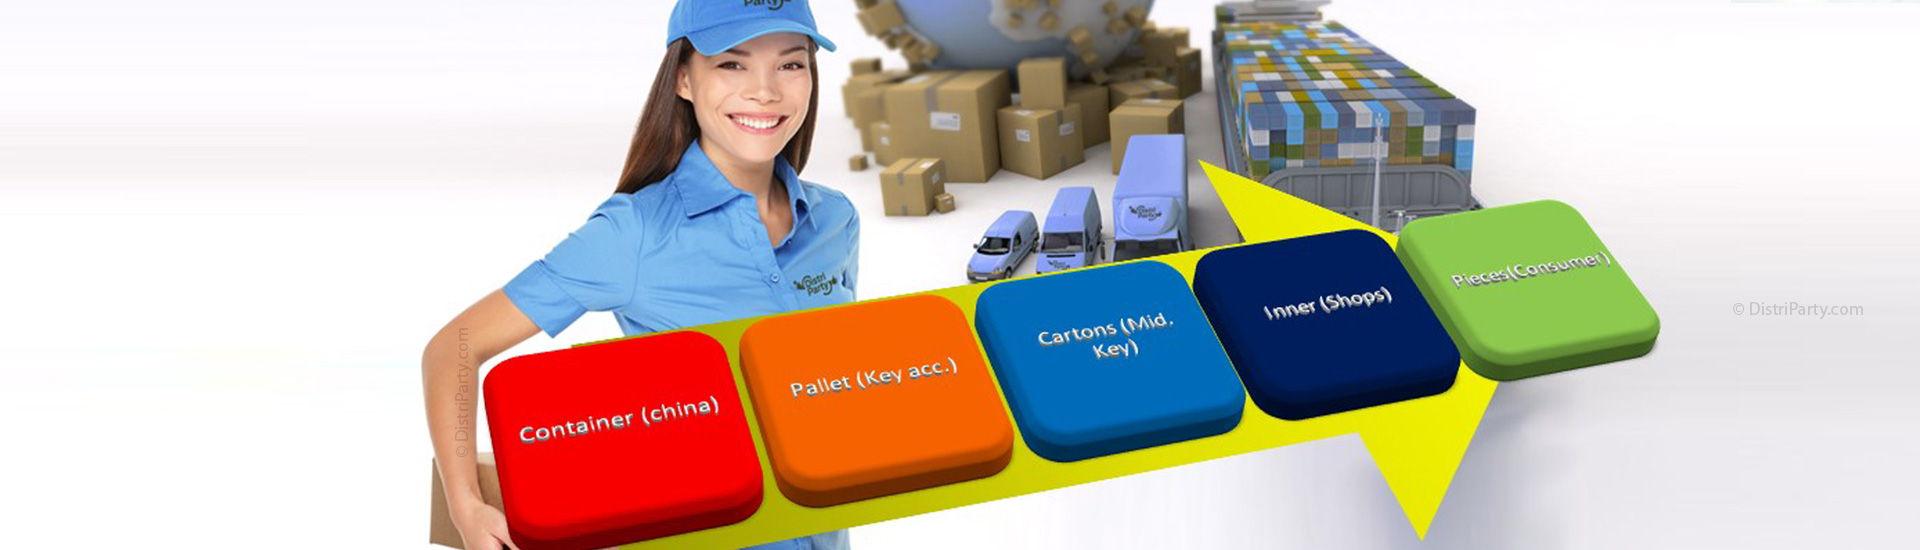 01-DistriParty-services